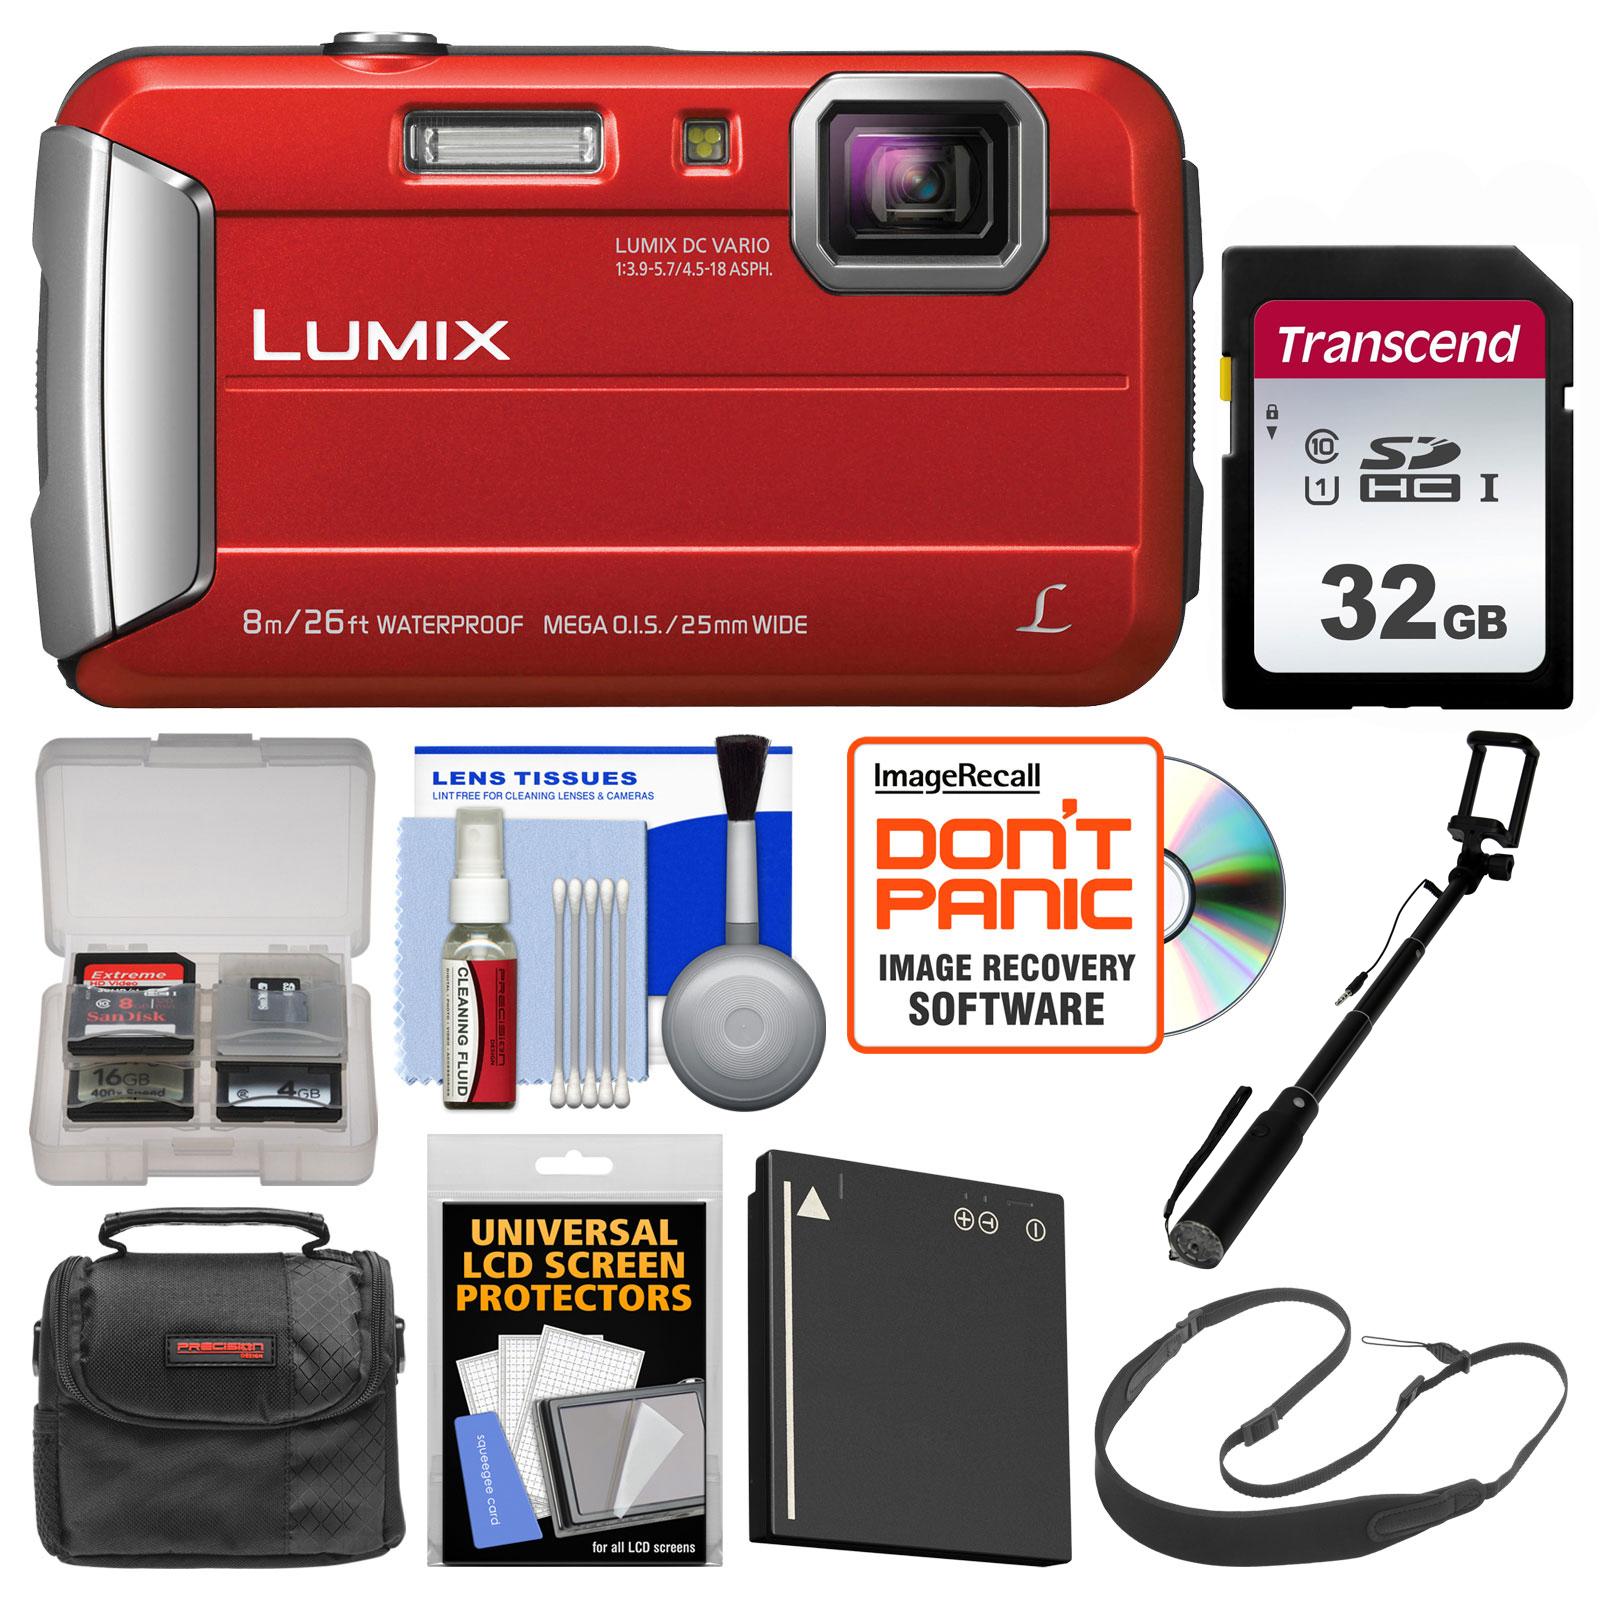 Panasonic Lumix DMC-TS30 Tough Shock + Waterproof Digital Camera (Red) with 32GB Card + Case + Battery + Selfie Stick Monopod + Sling Strap Kit